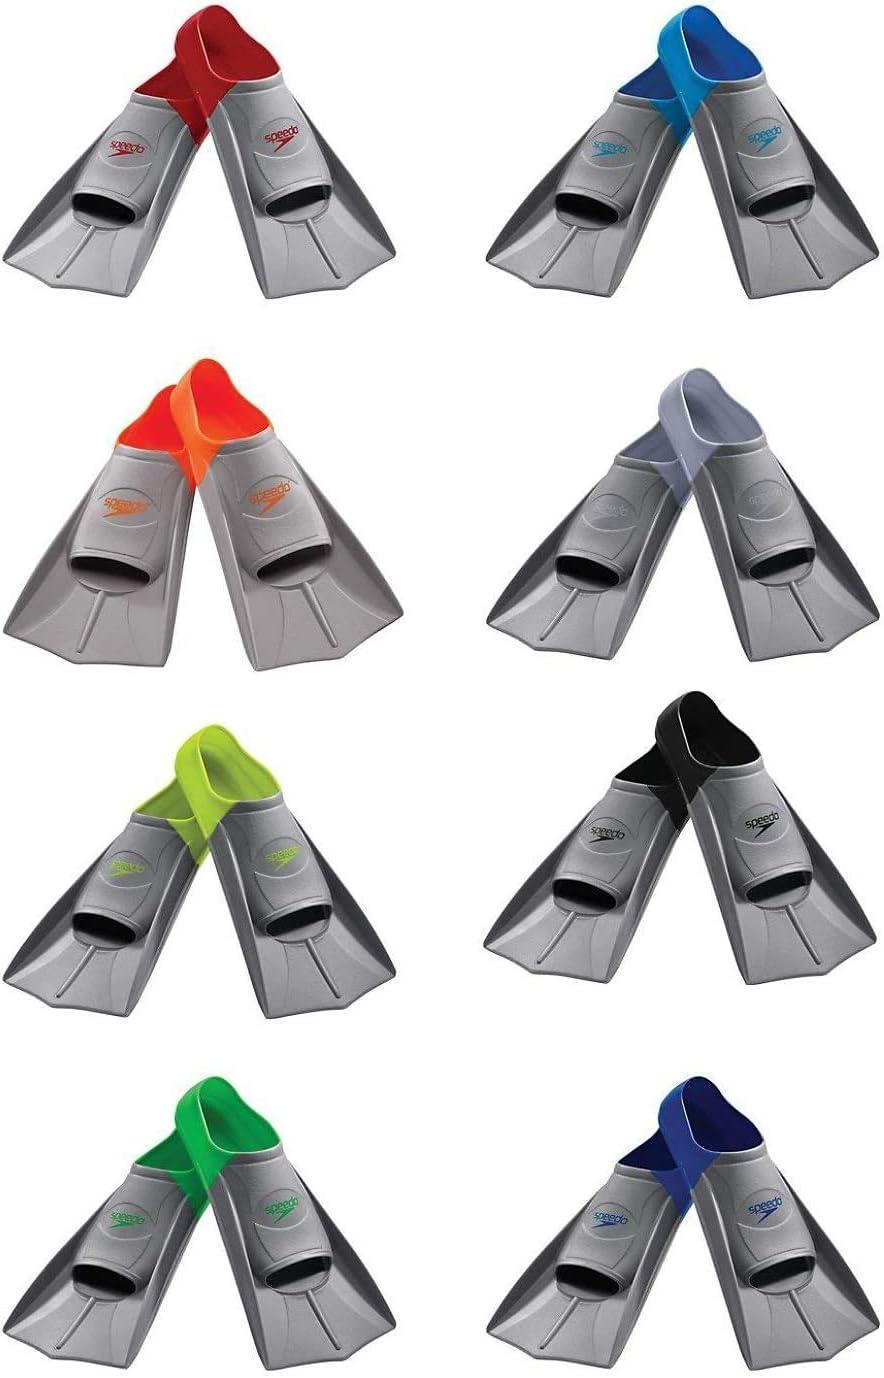 Speedo Multicolored Short Blade Training Fin